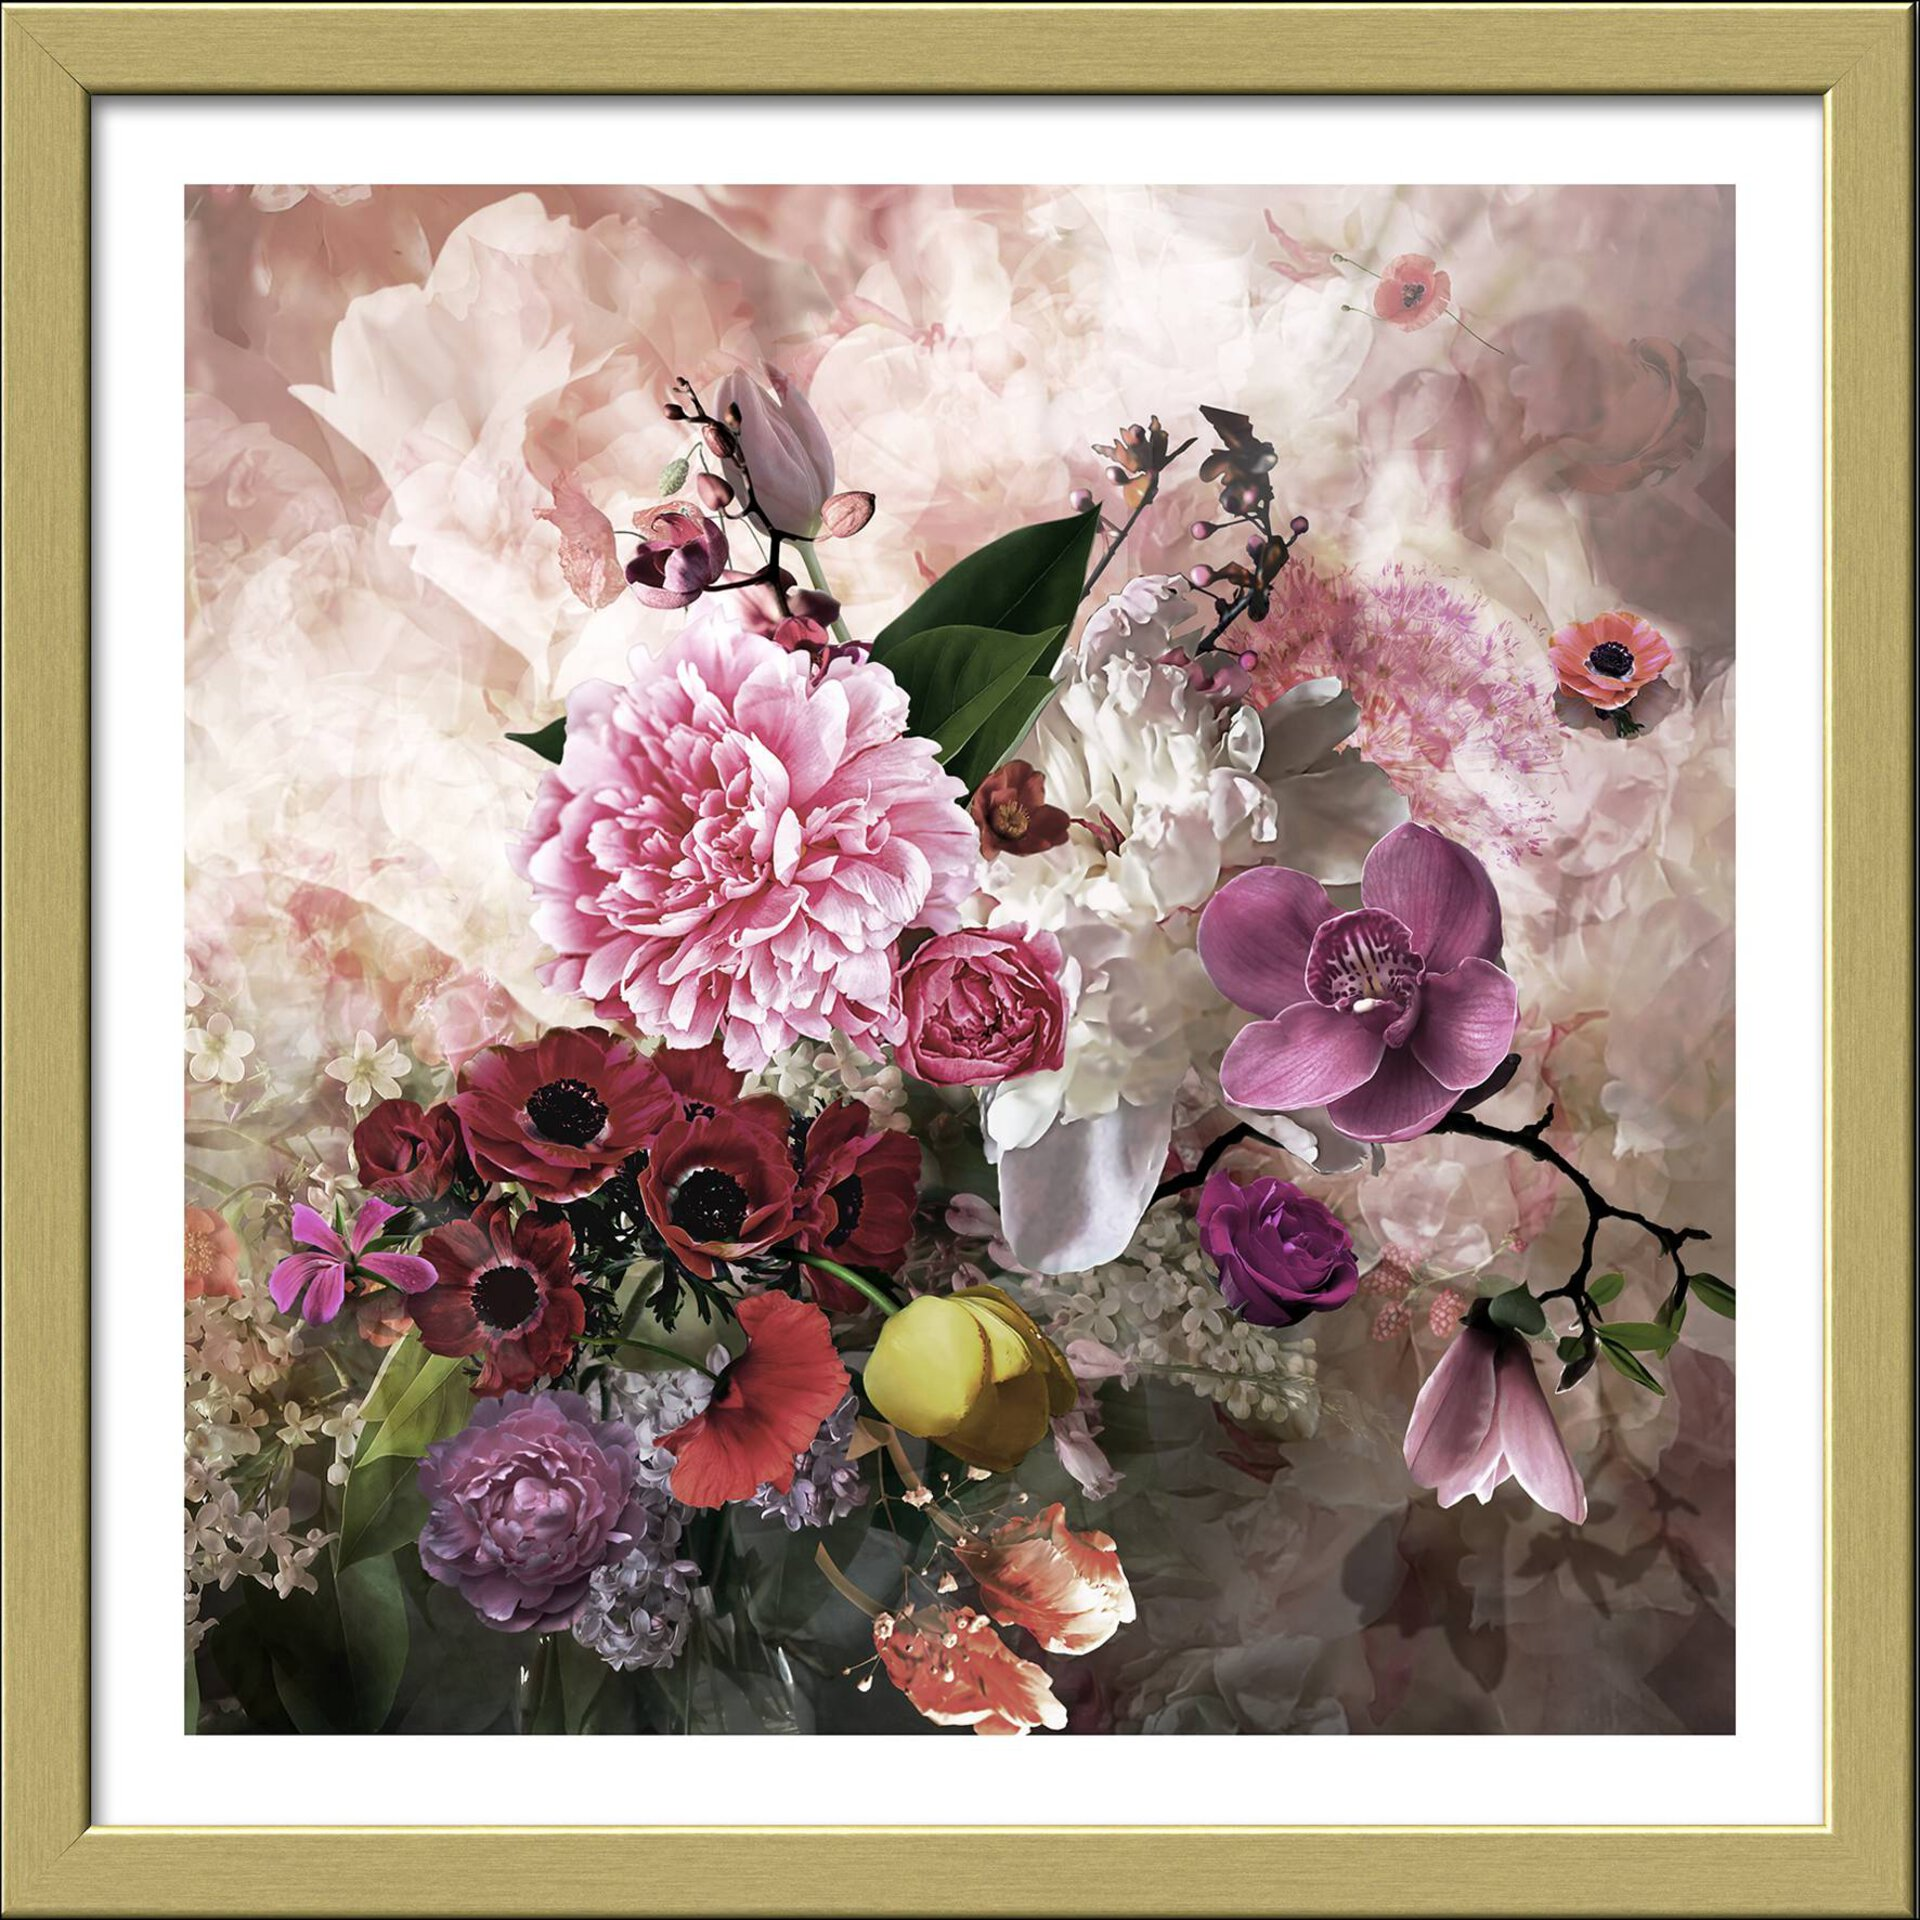 Bild Baroque Flowermix II Pro-Art Papier mehrfarbig 32 x 32 x 2 cm